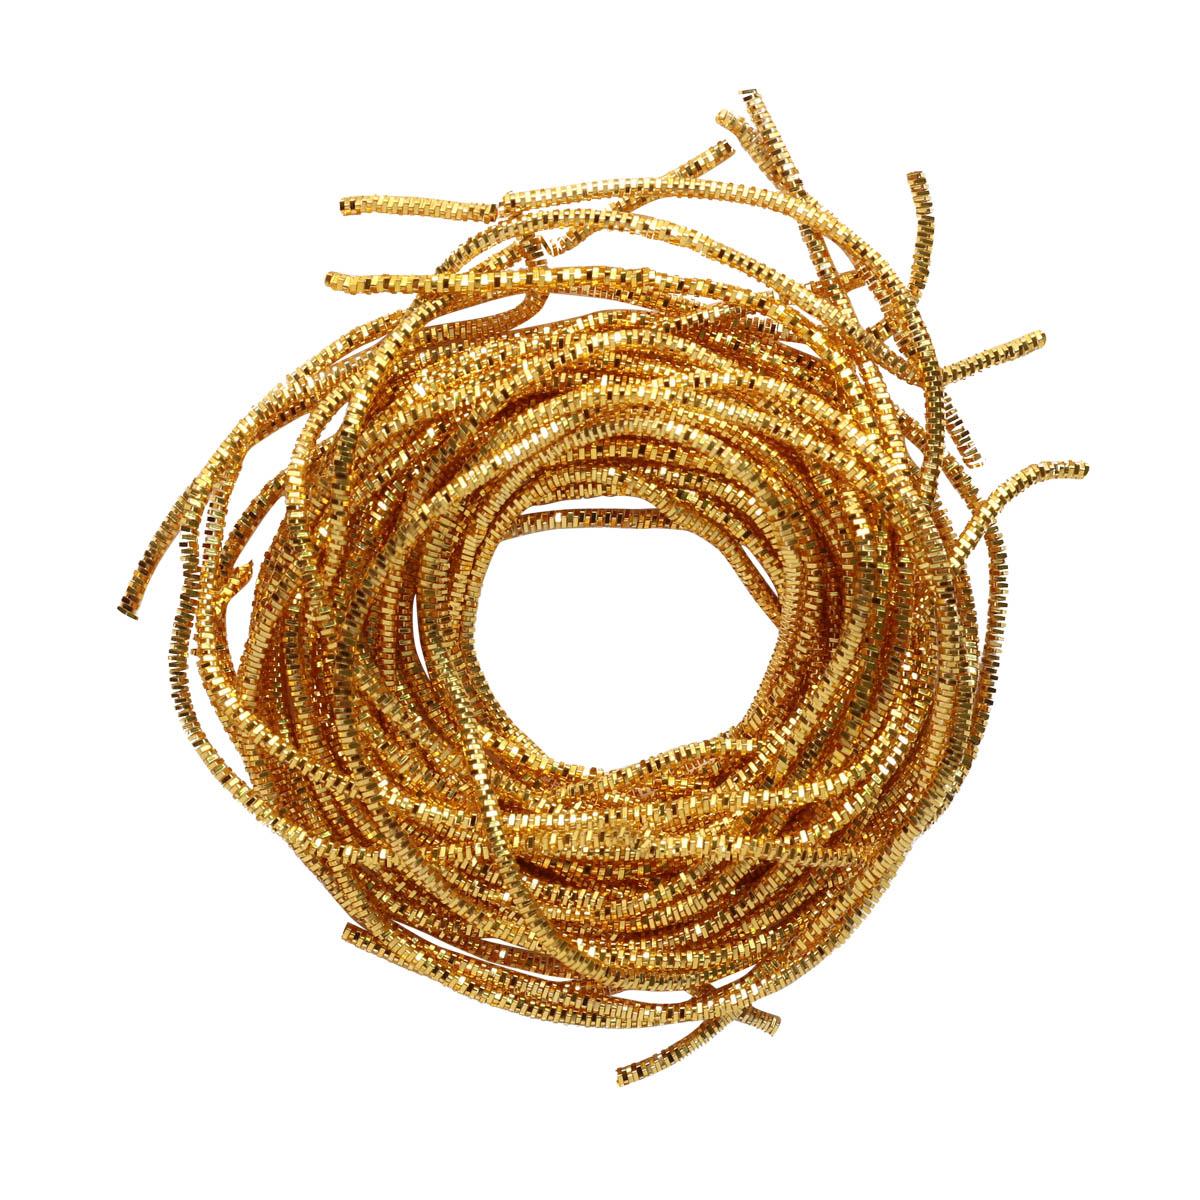 ТК001НН07 Трунцал Золото 0,7 мм 5 грамм +-/- 0,1 гр.